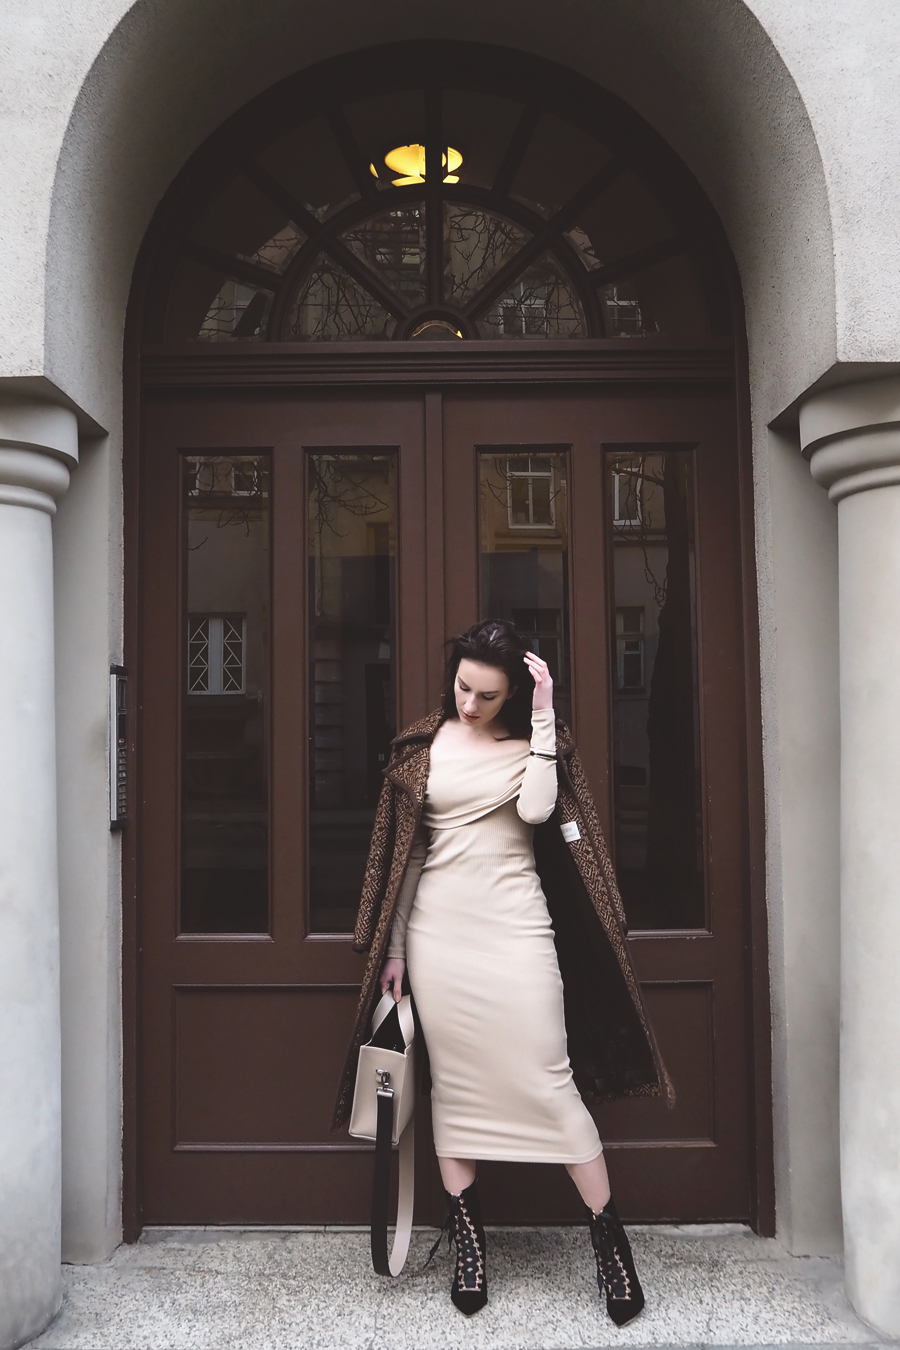 Zaful dress + Stuudio Nahk bag